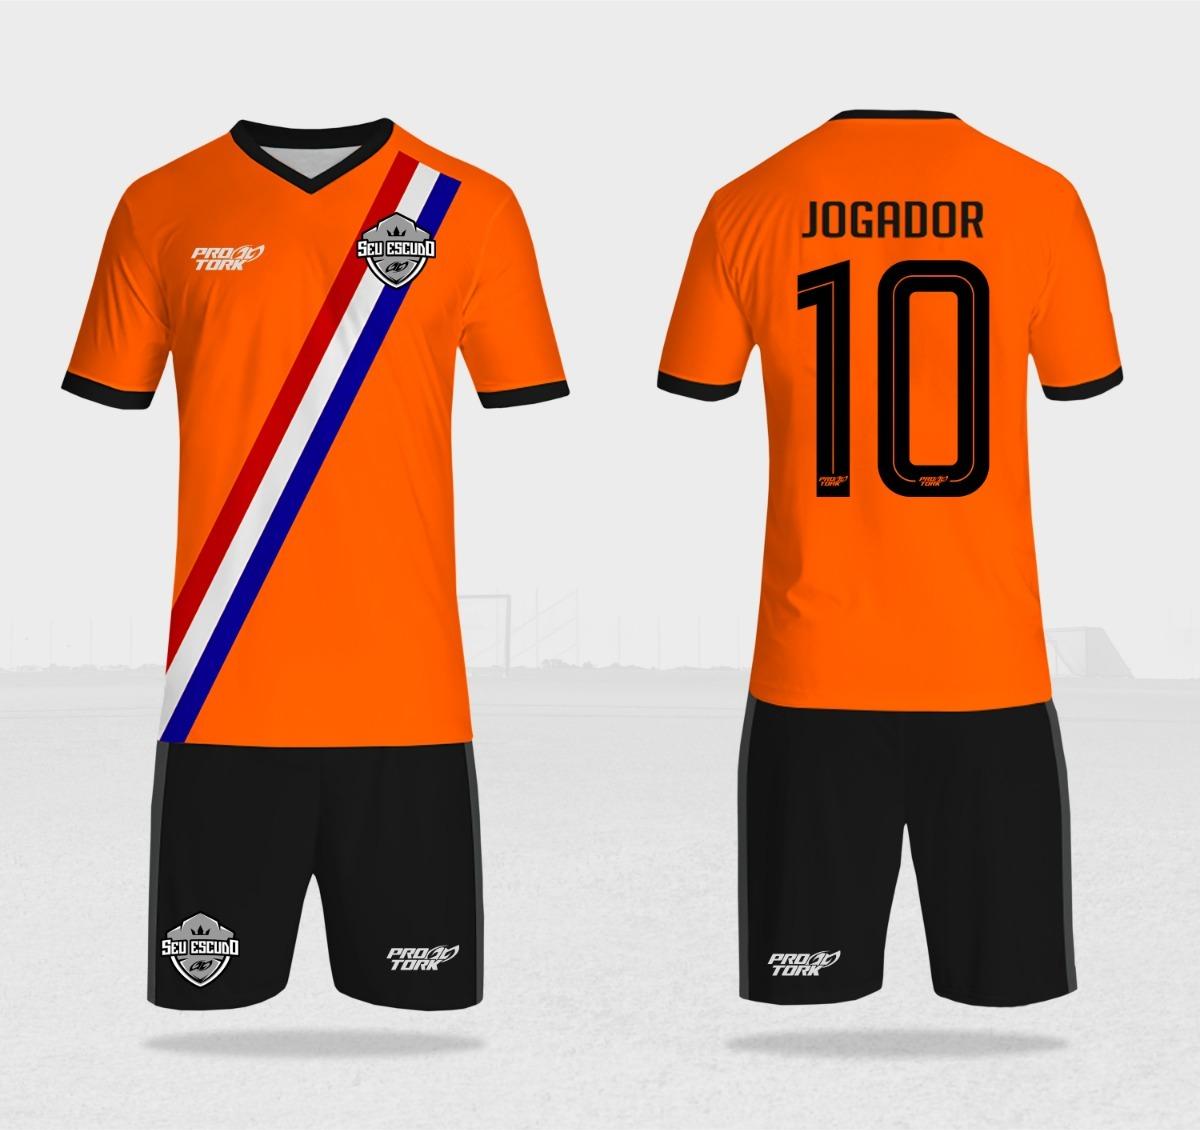 26bcaea3a camisa personalizada futebol ou futsal 16un. Carregando zoom.